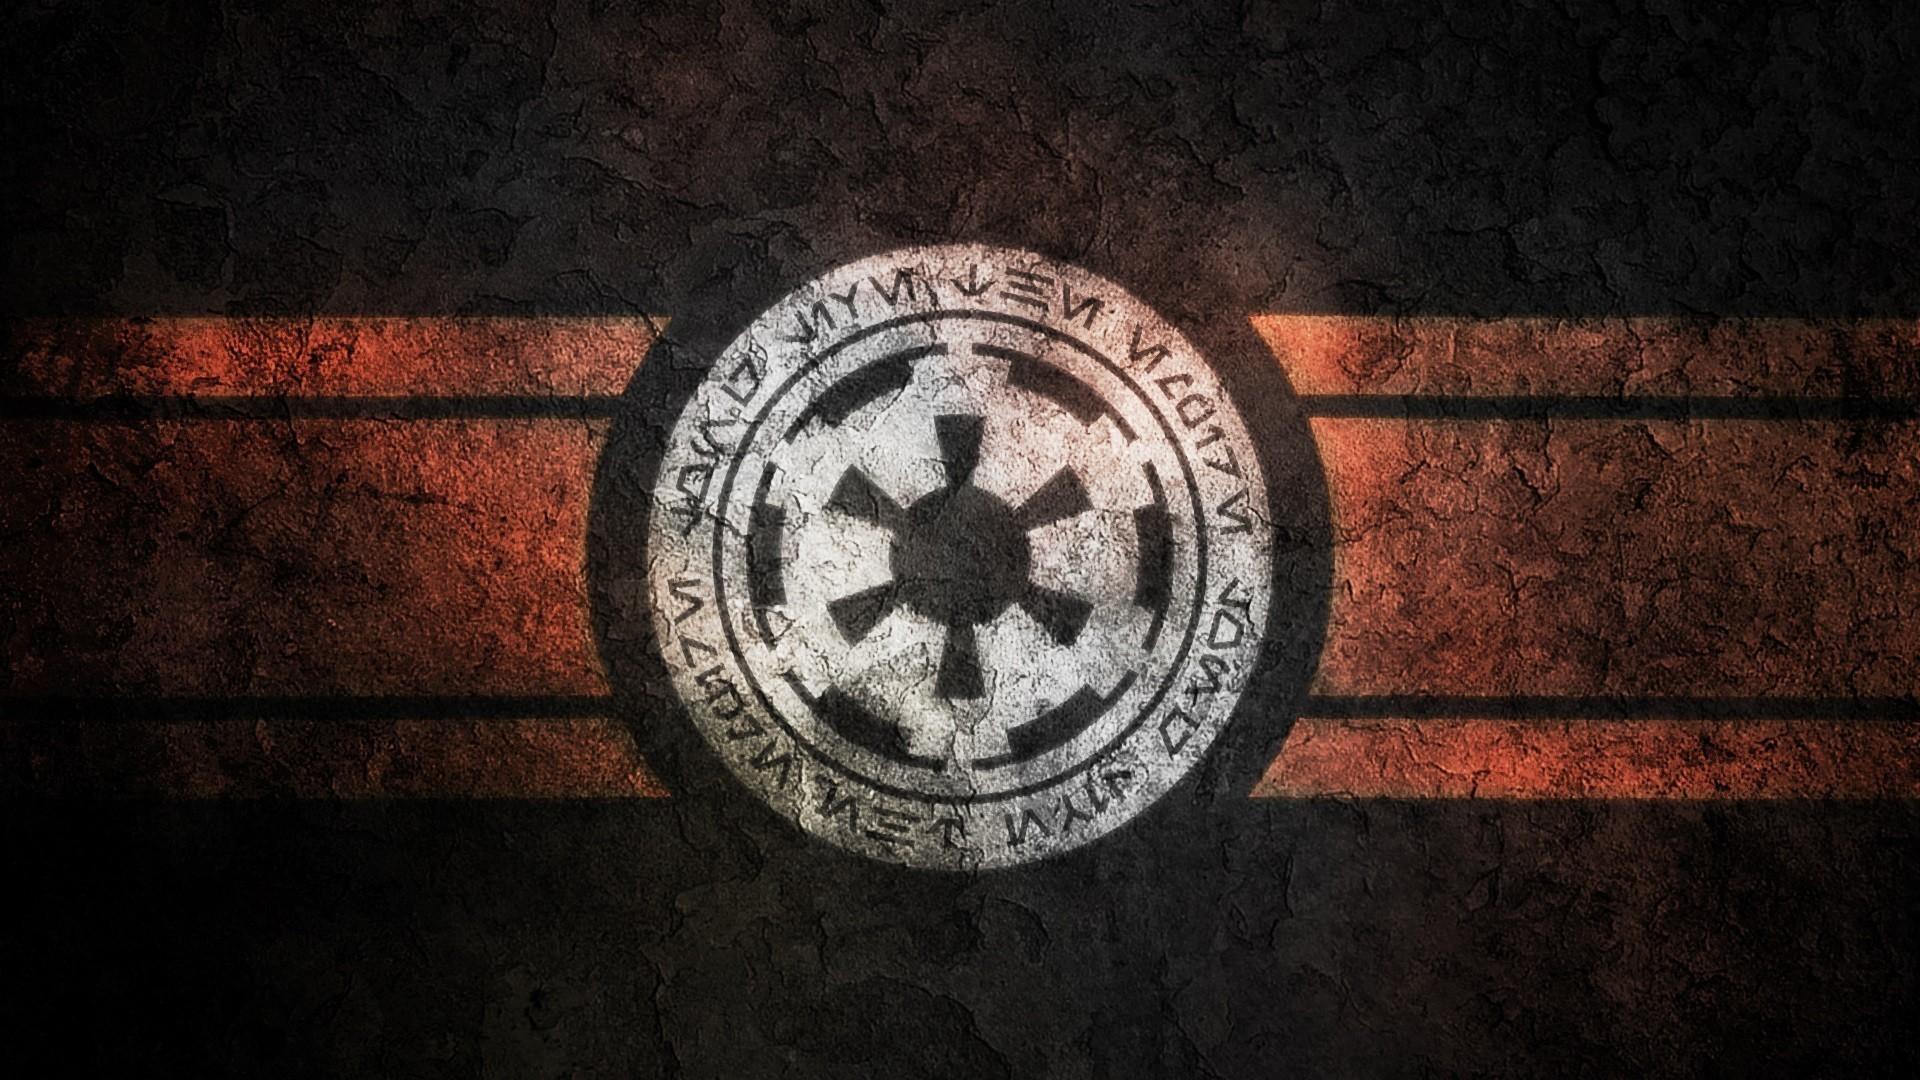 High Resolution Star Wars Logo Background Wallpaper Full Size .